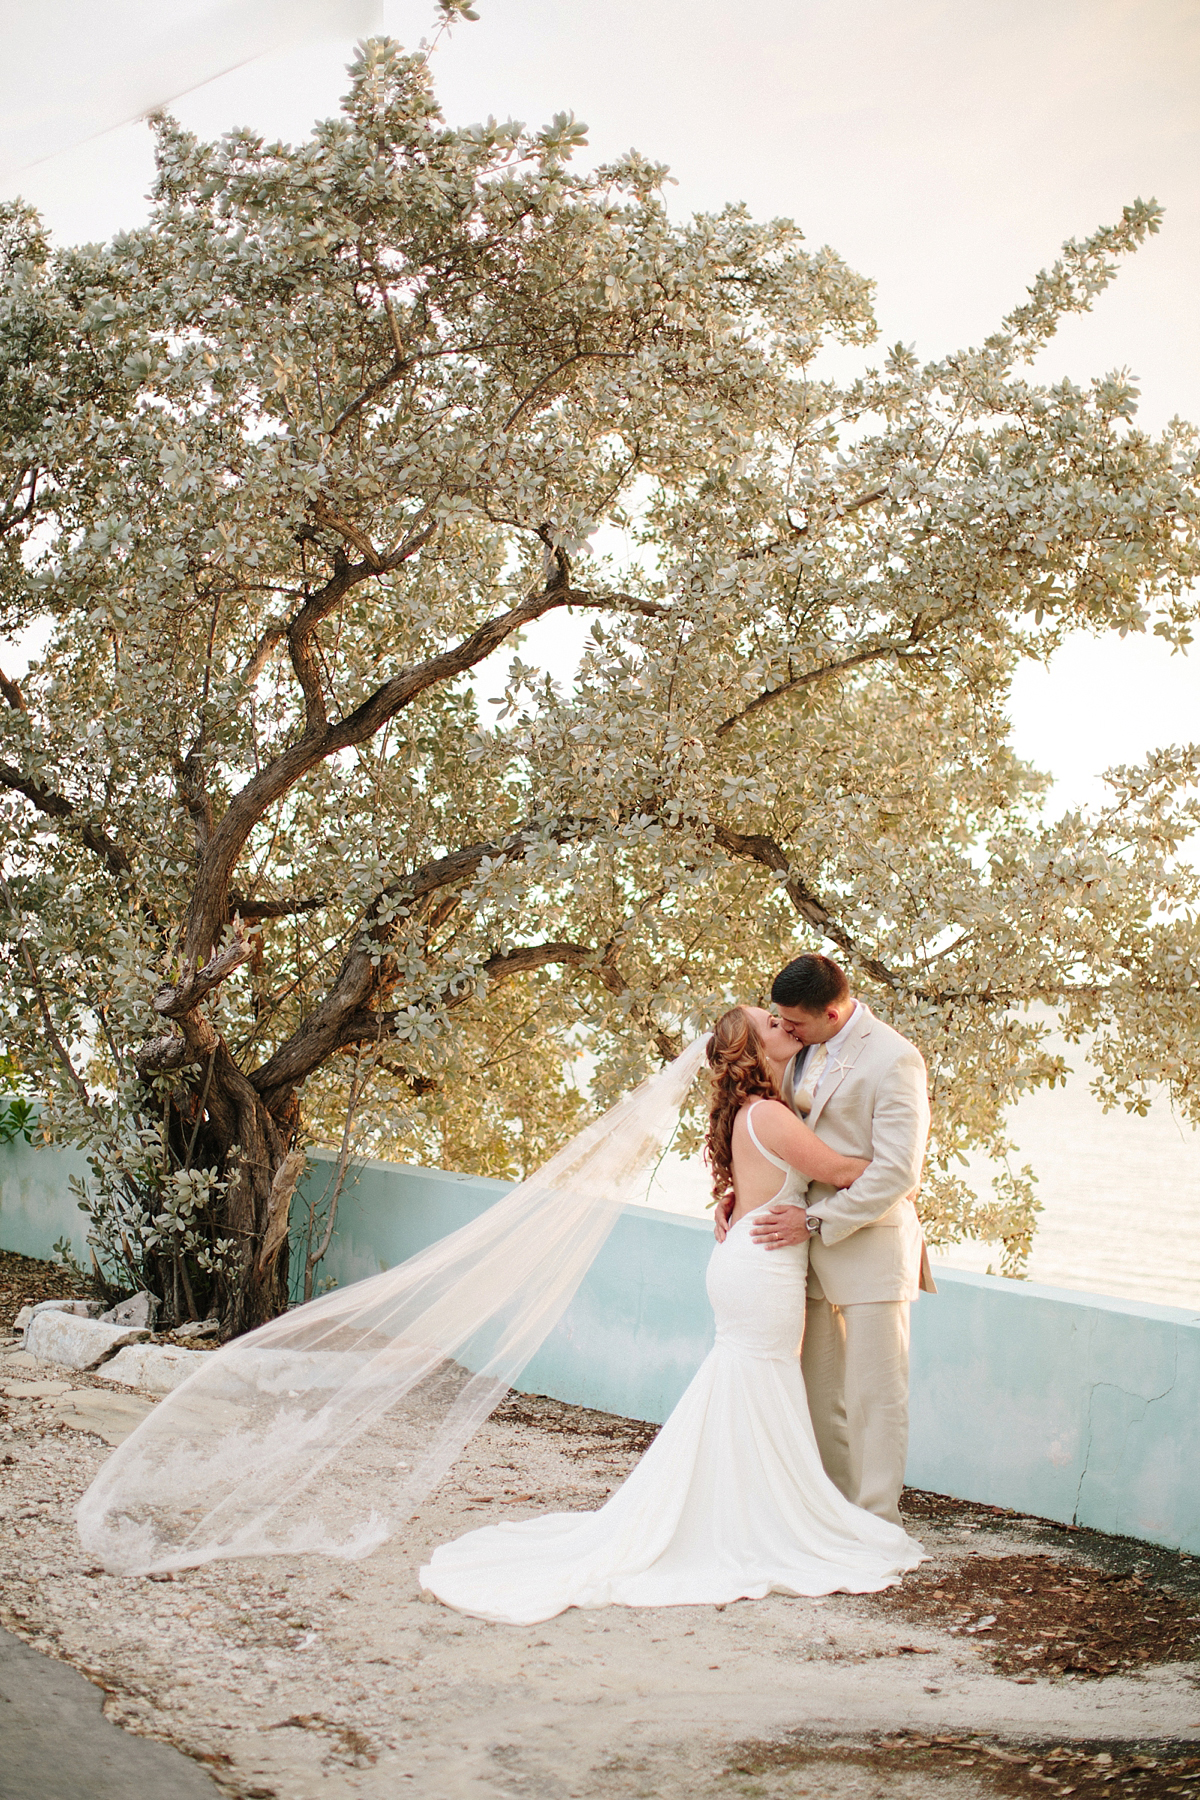 bahamas-destination-wedding-photographer-island-private-ceremony-staniel-cay_0045.jpg